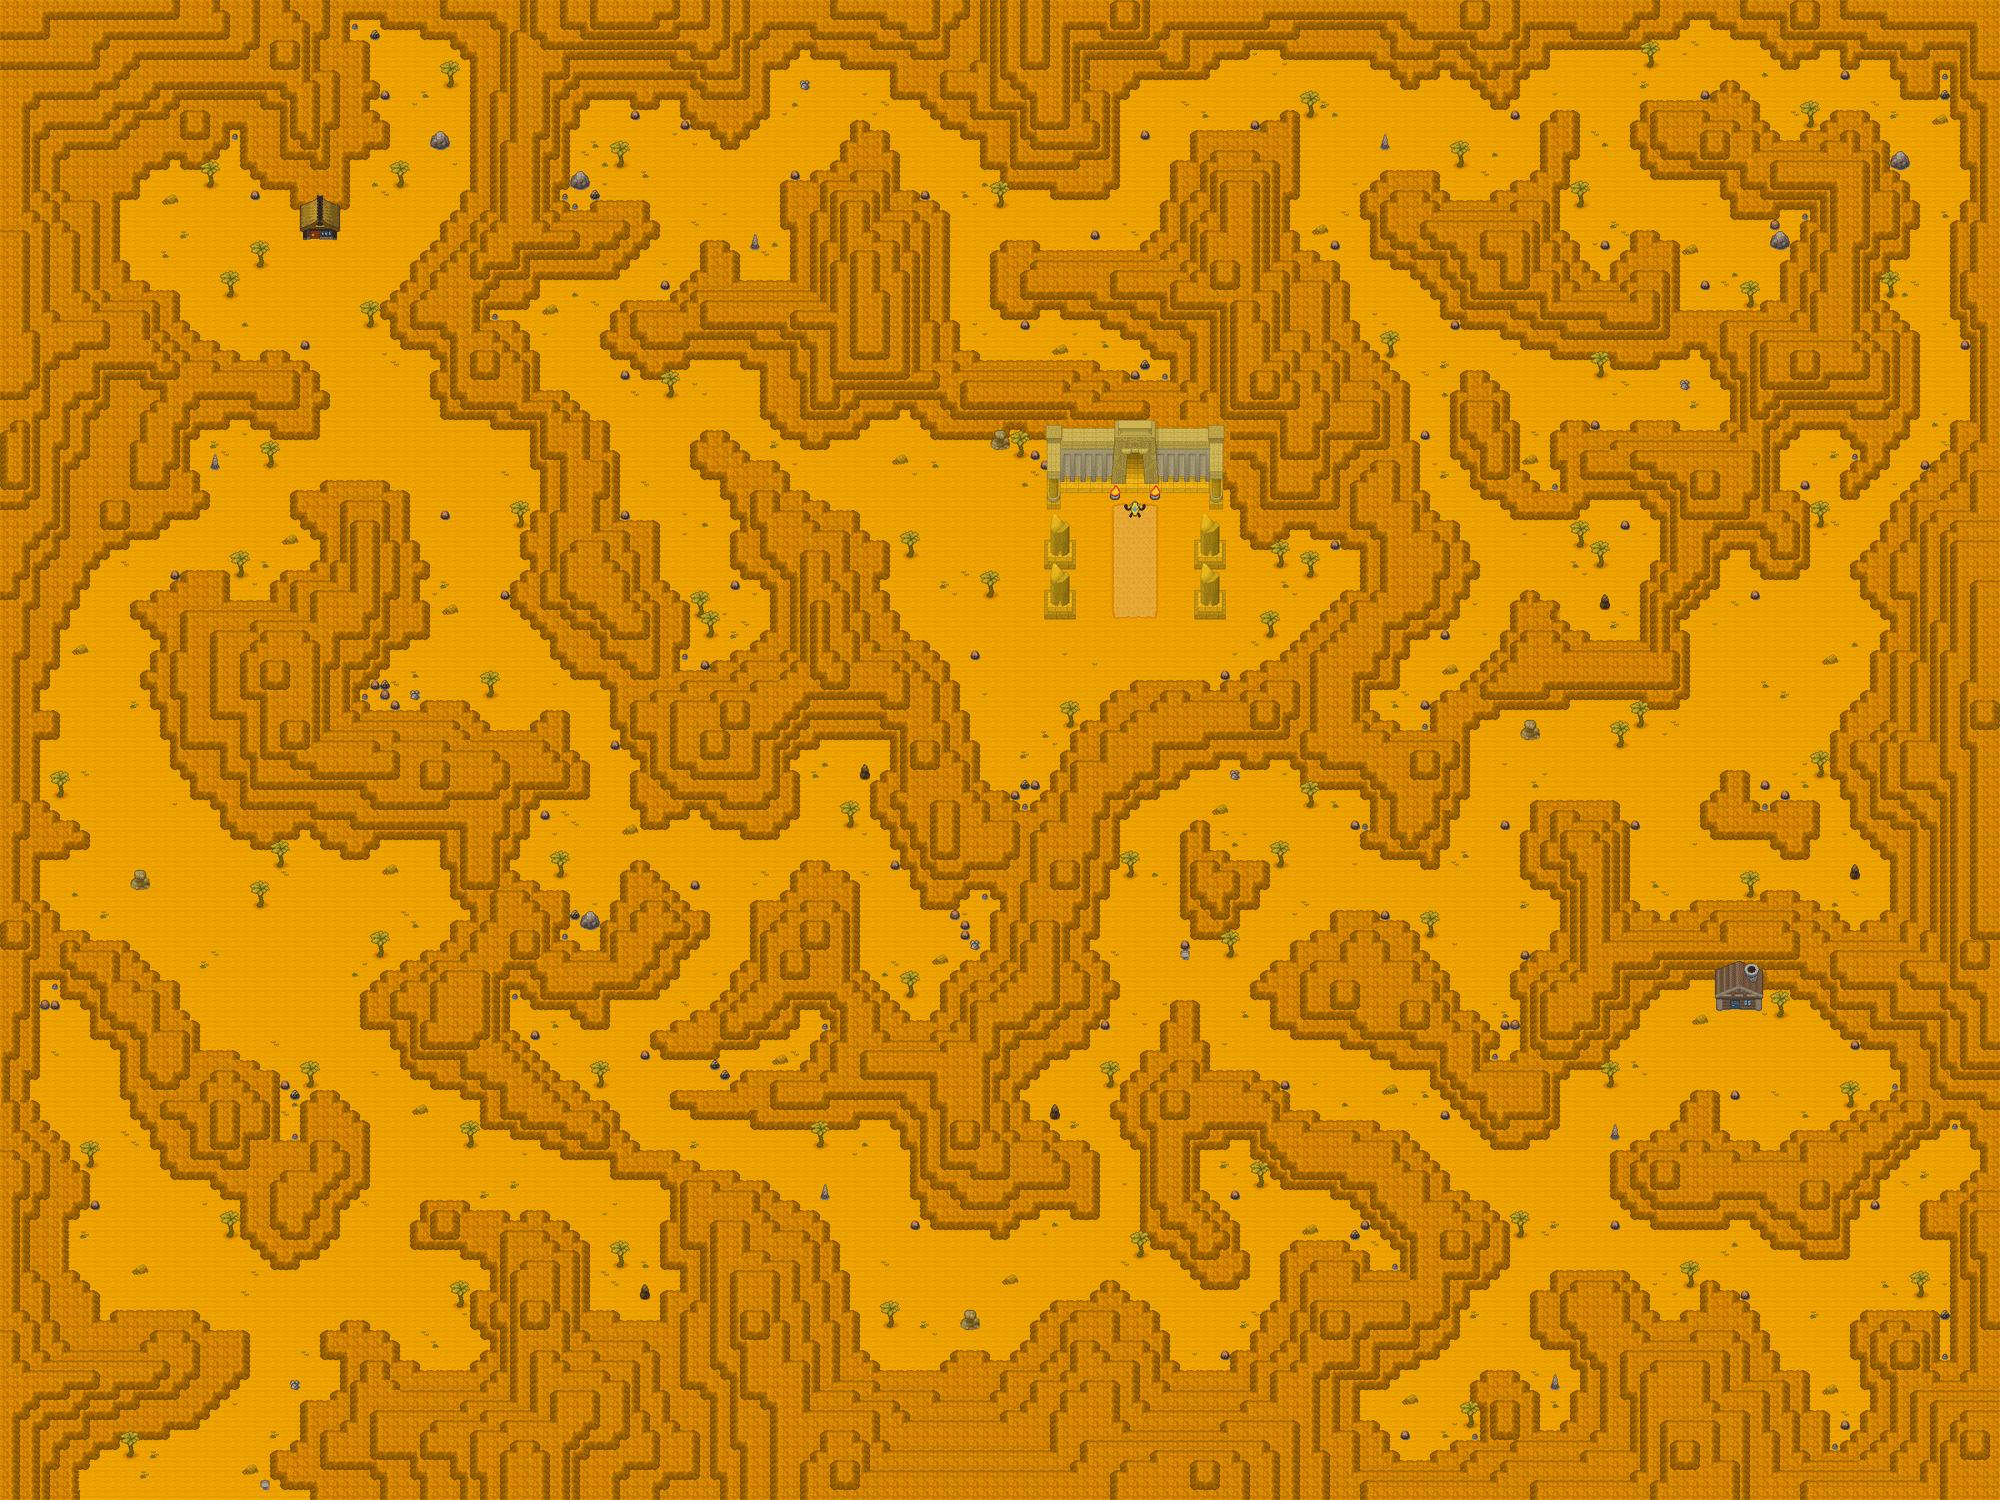 Pokémon-Map: Wüstengebirge